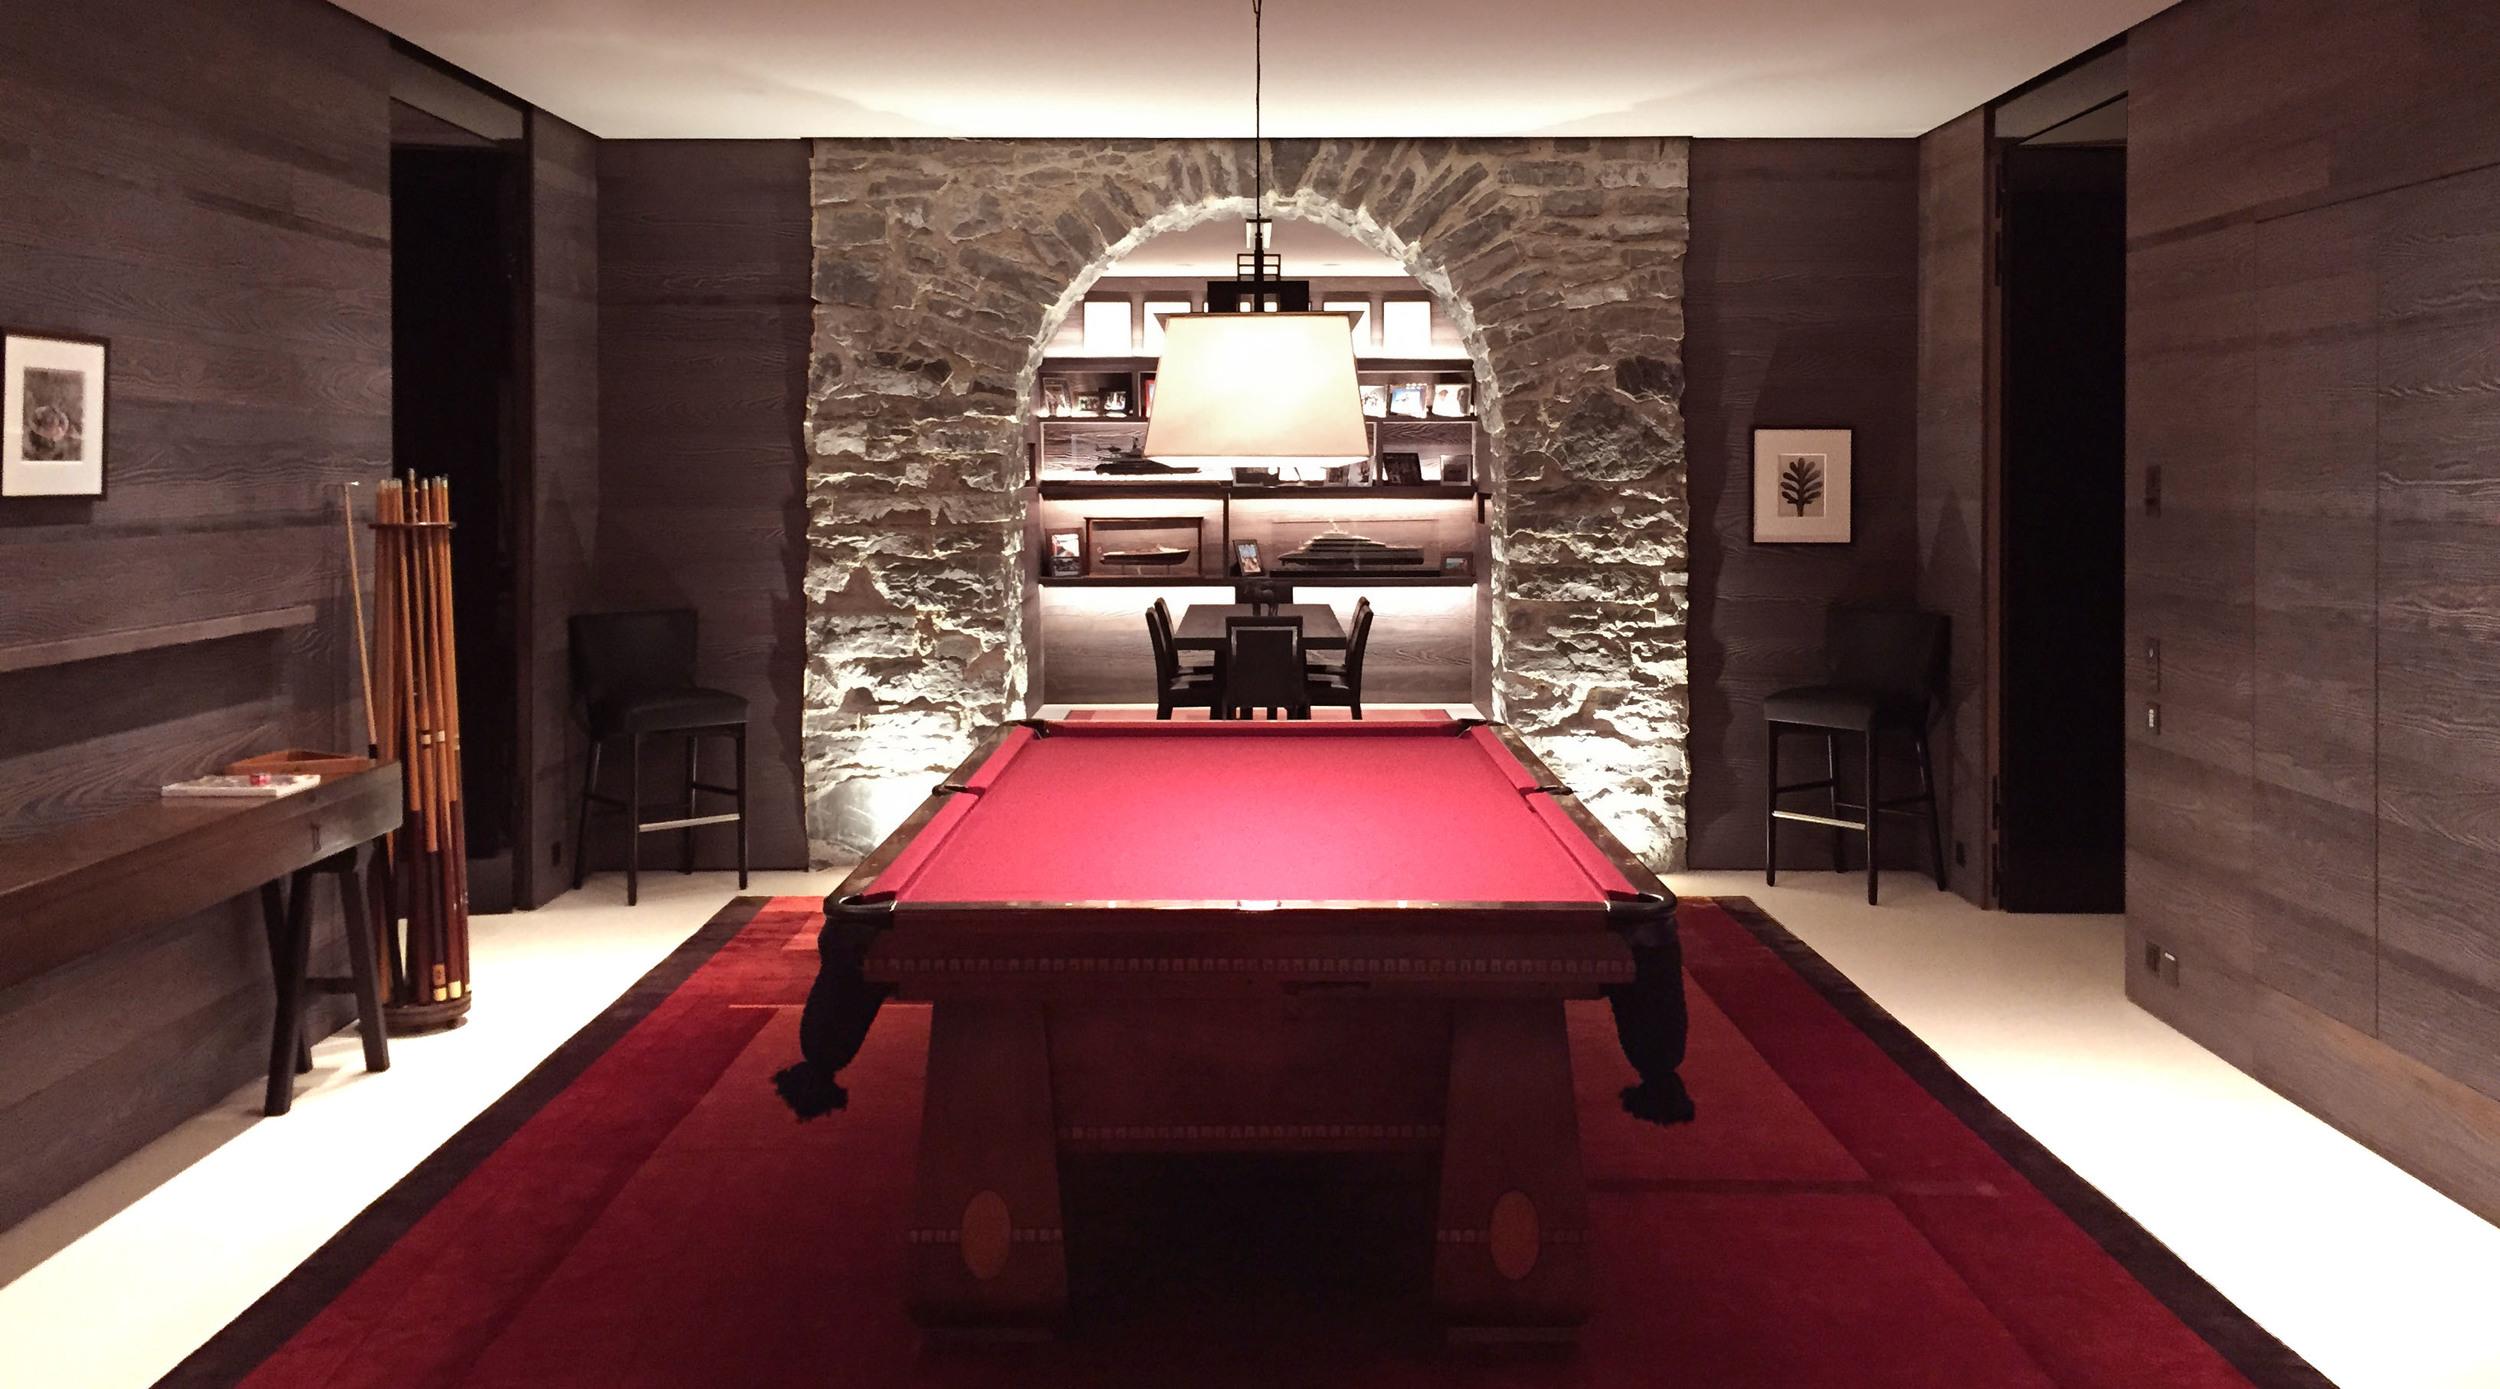 Geneva - Billiard